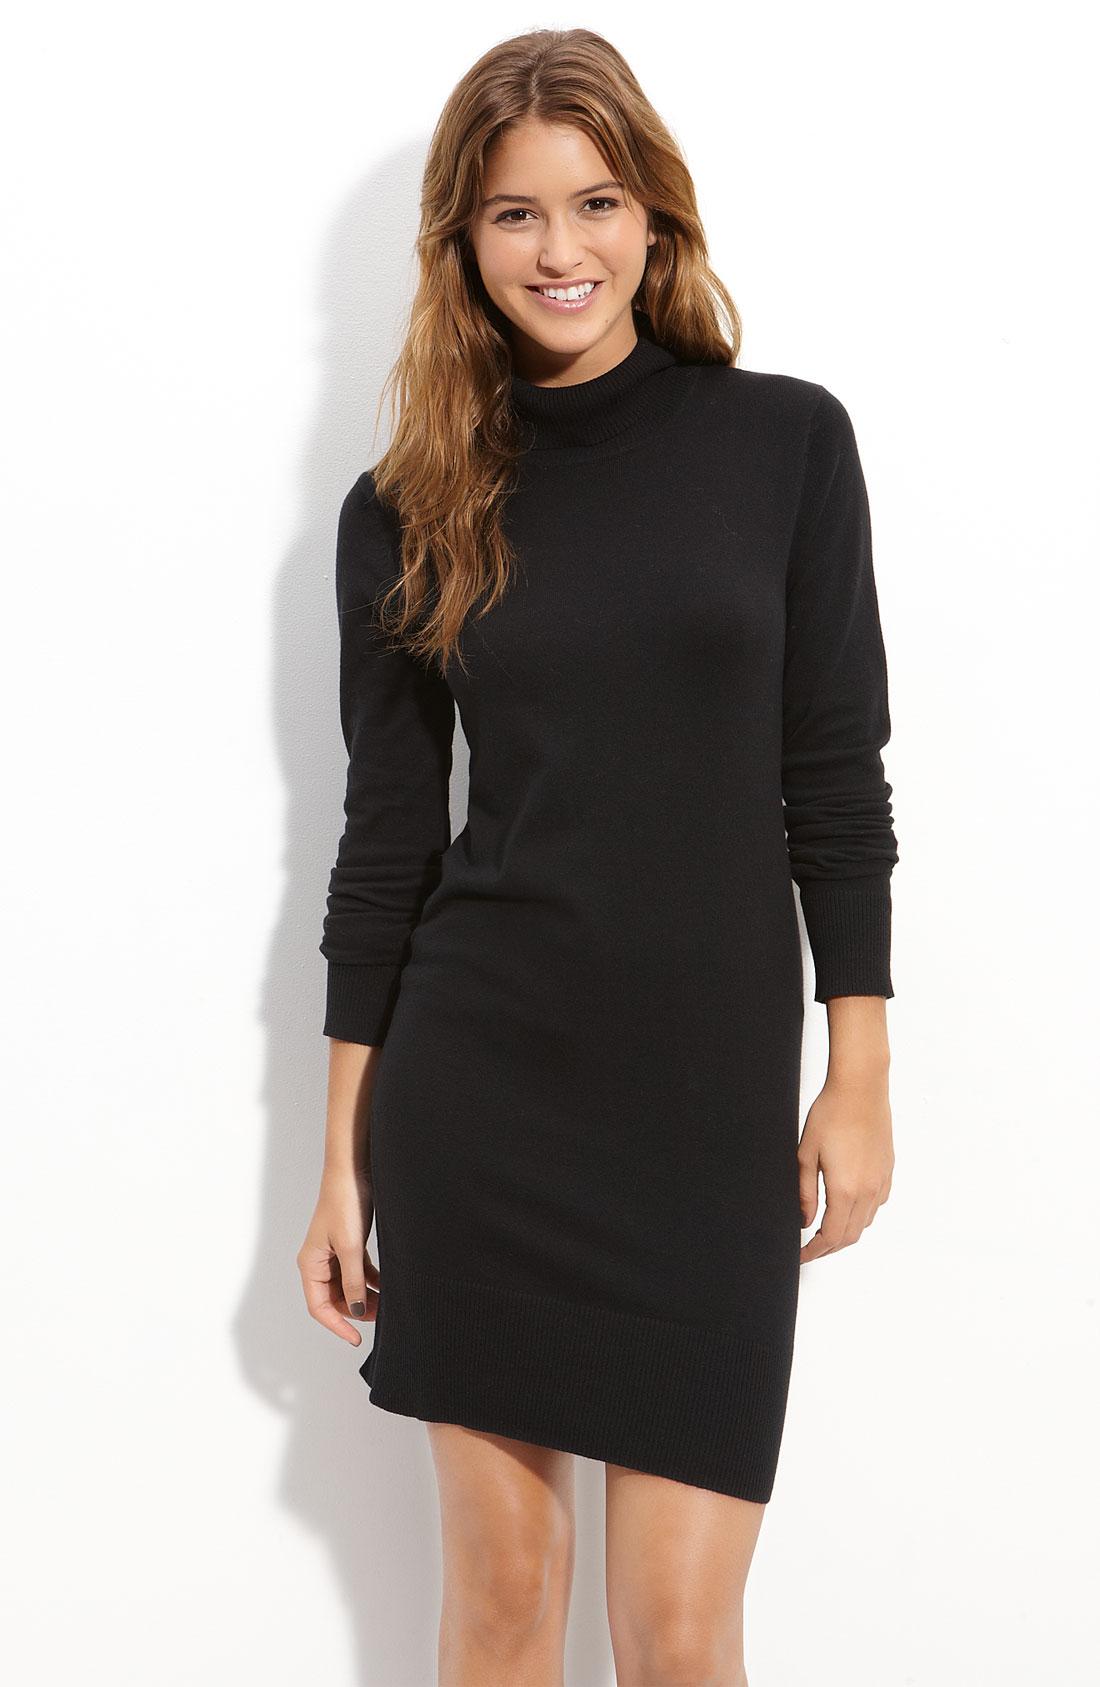 Frenchiu00ae Turtleneck Sweater Dress in Black | Lyst